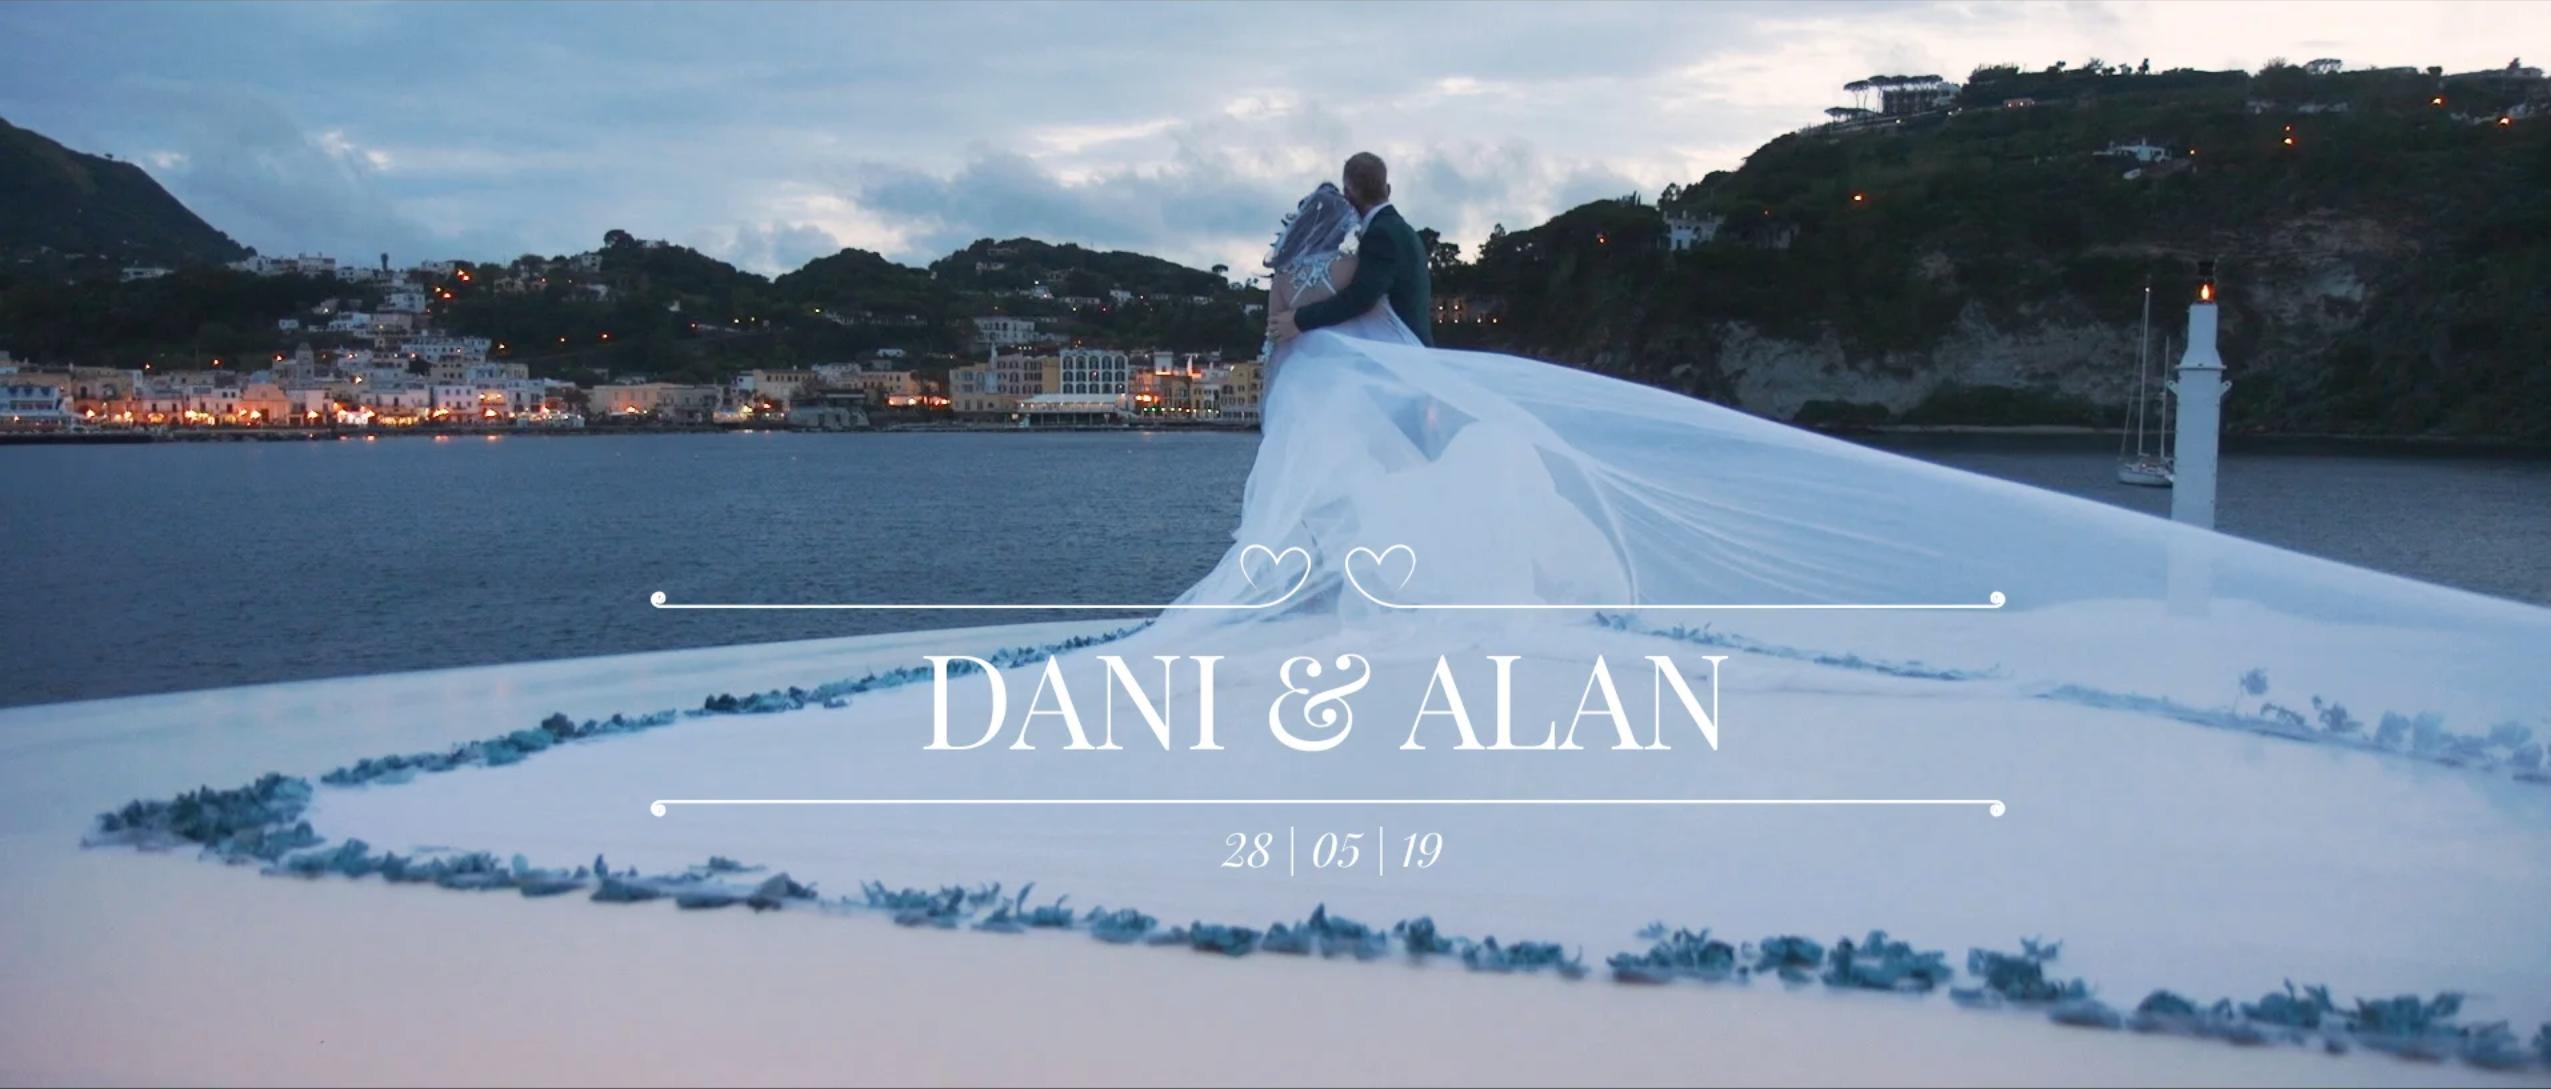 Dani + Alan | Ischia, Italy | O'Mega